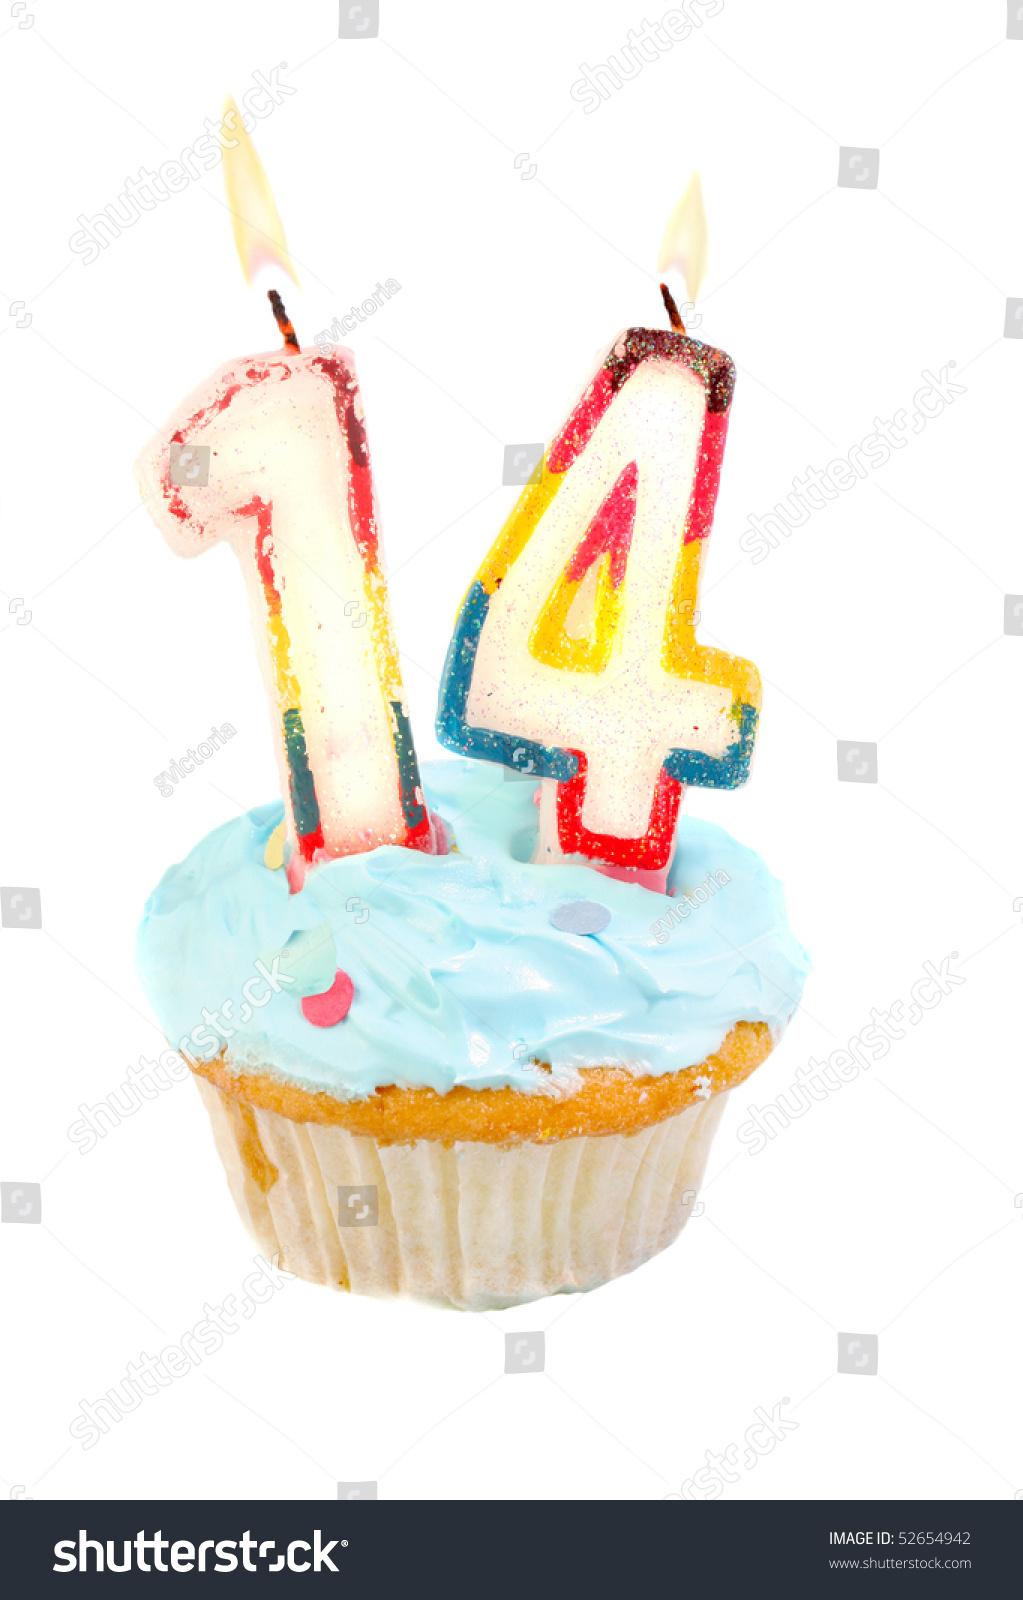 Fourteenth Birthday Cupcake Blue Frosting On Stock Photo